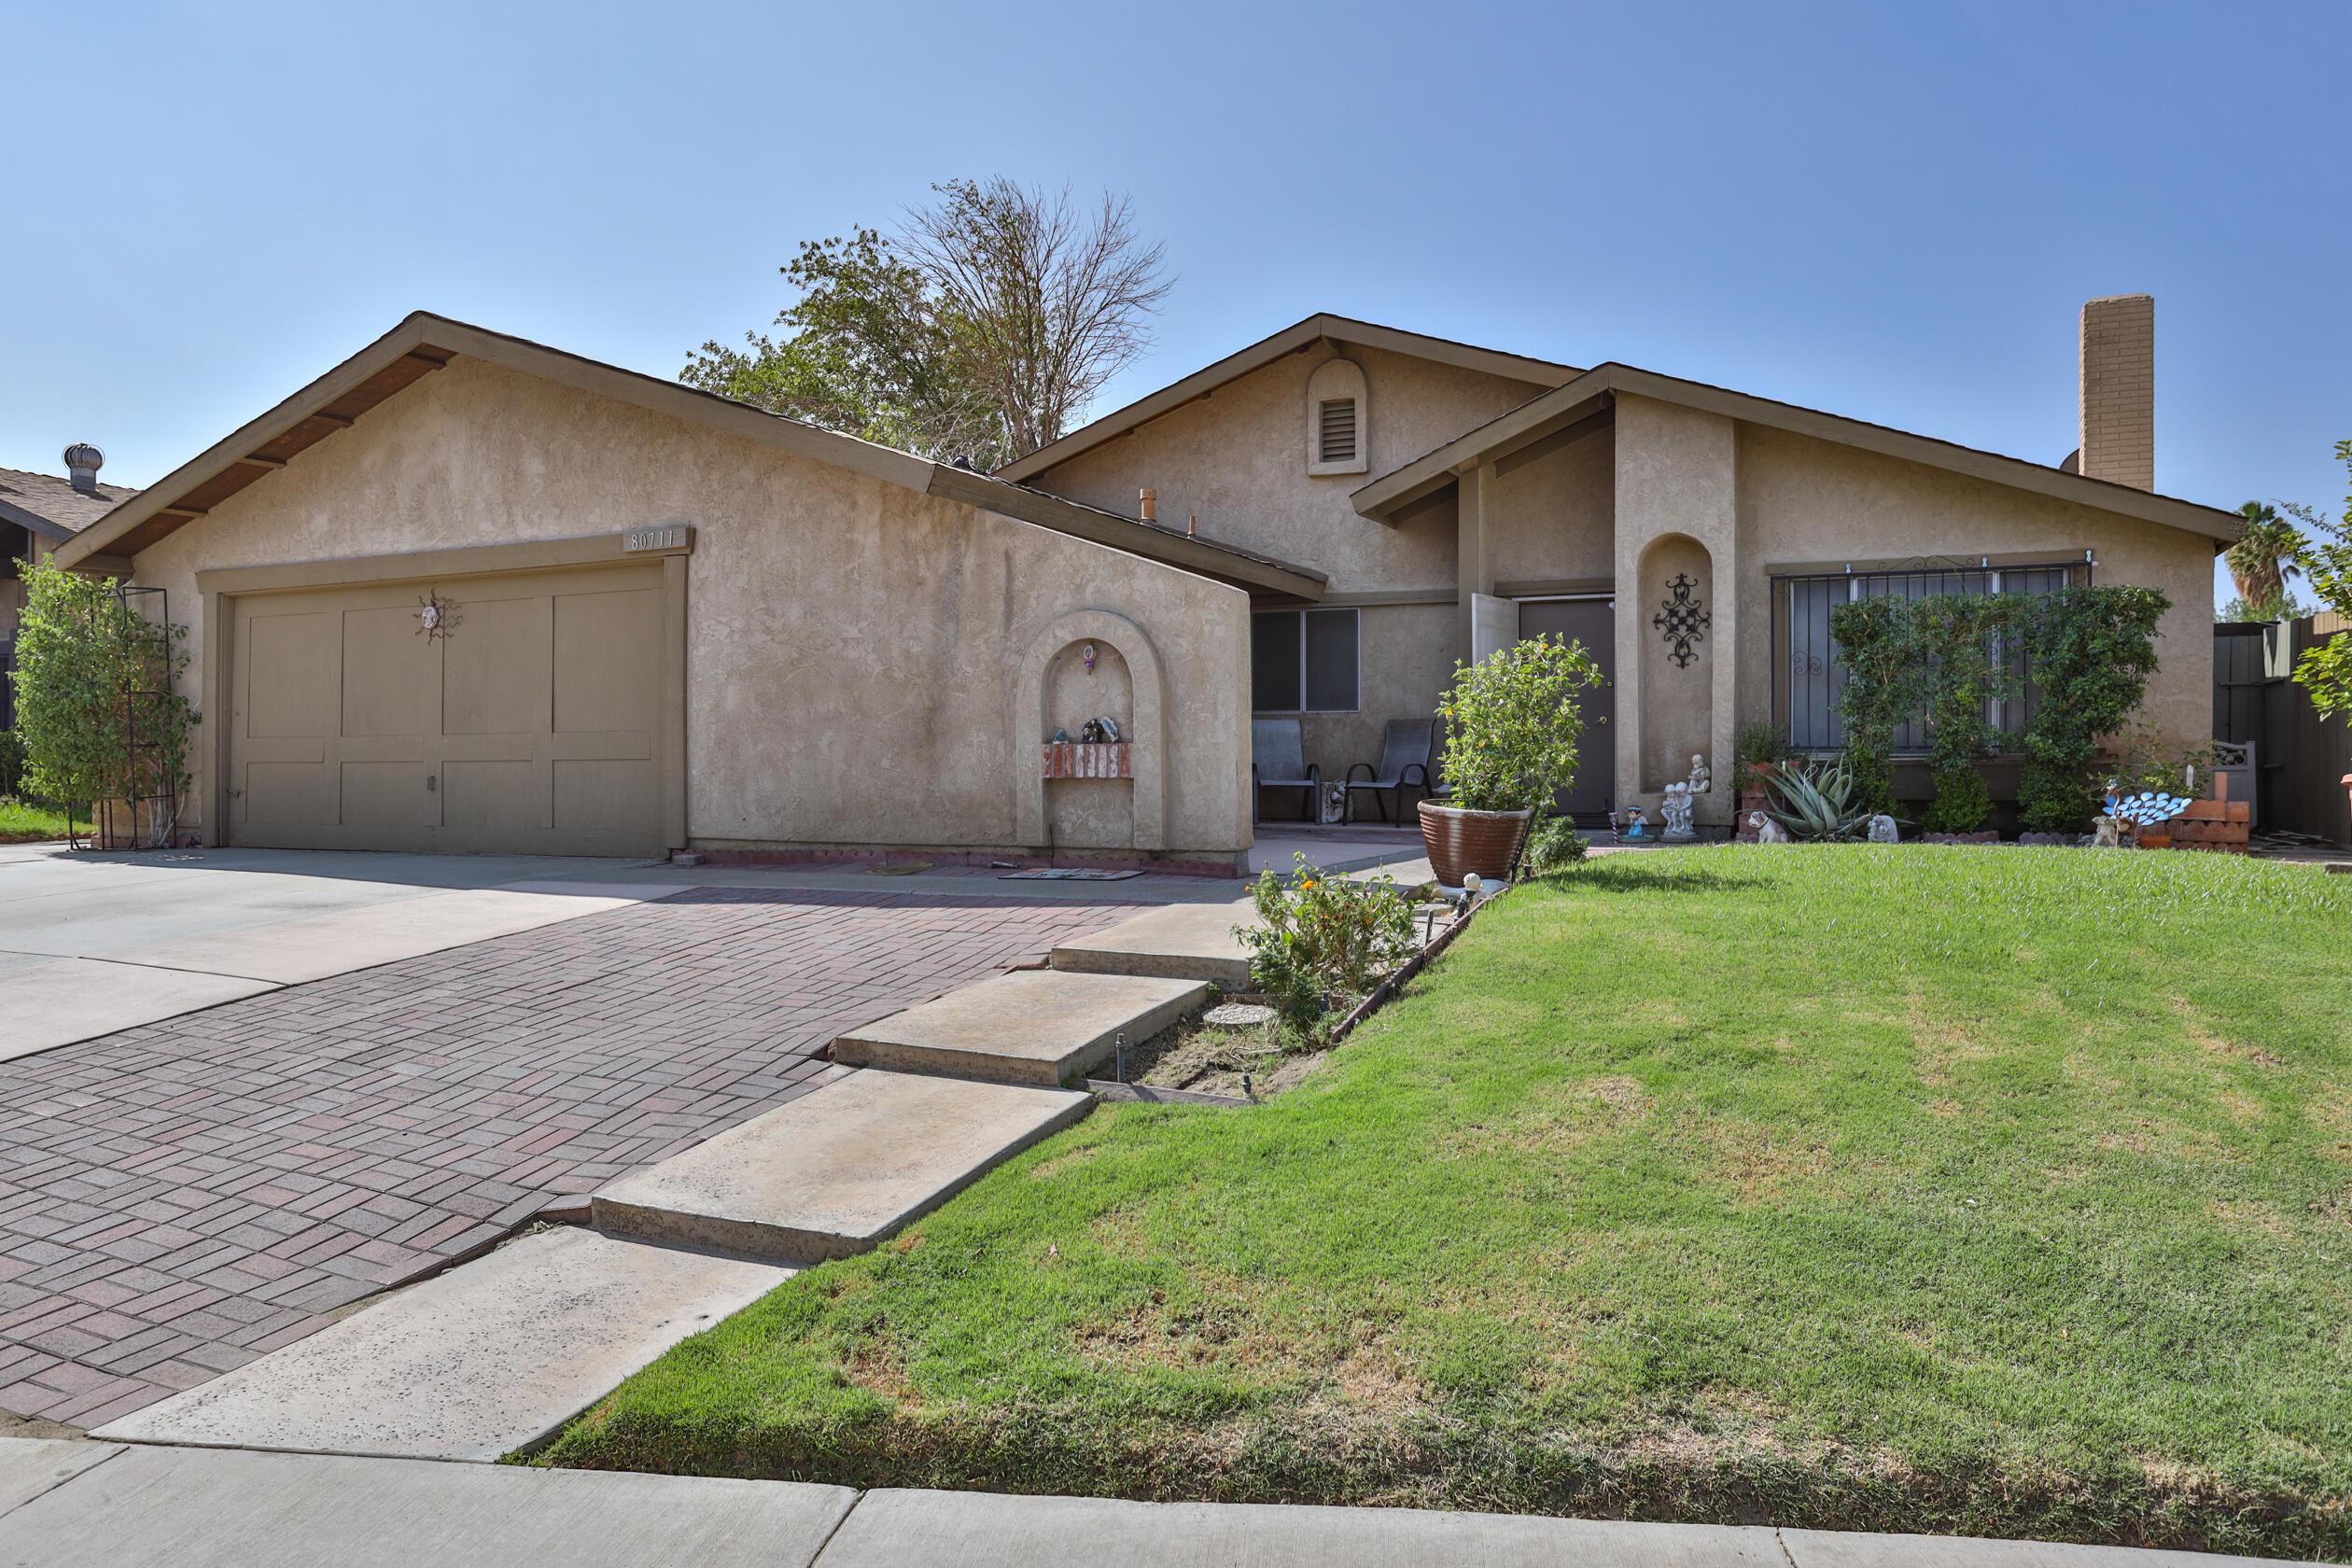 Photo of 80711 Columbia Avenue, Indio, CA 92201